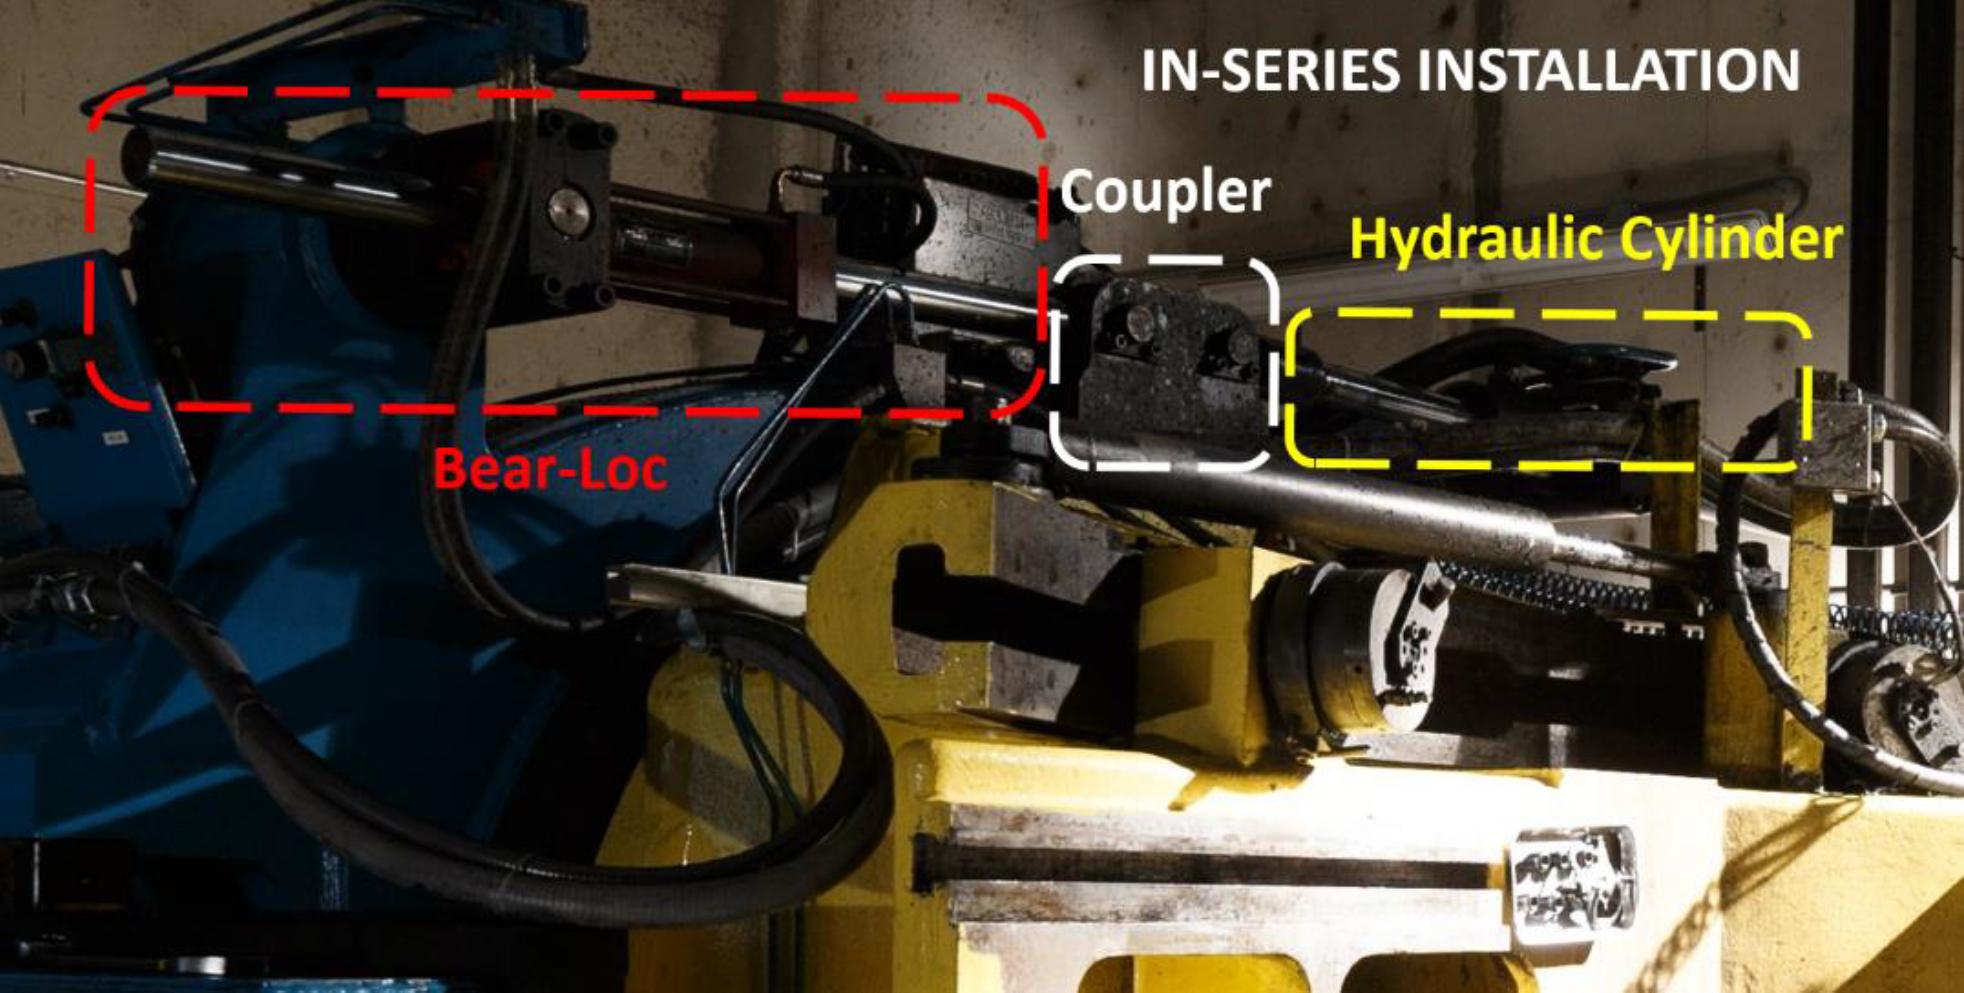 in-series rod lock installation